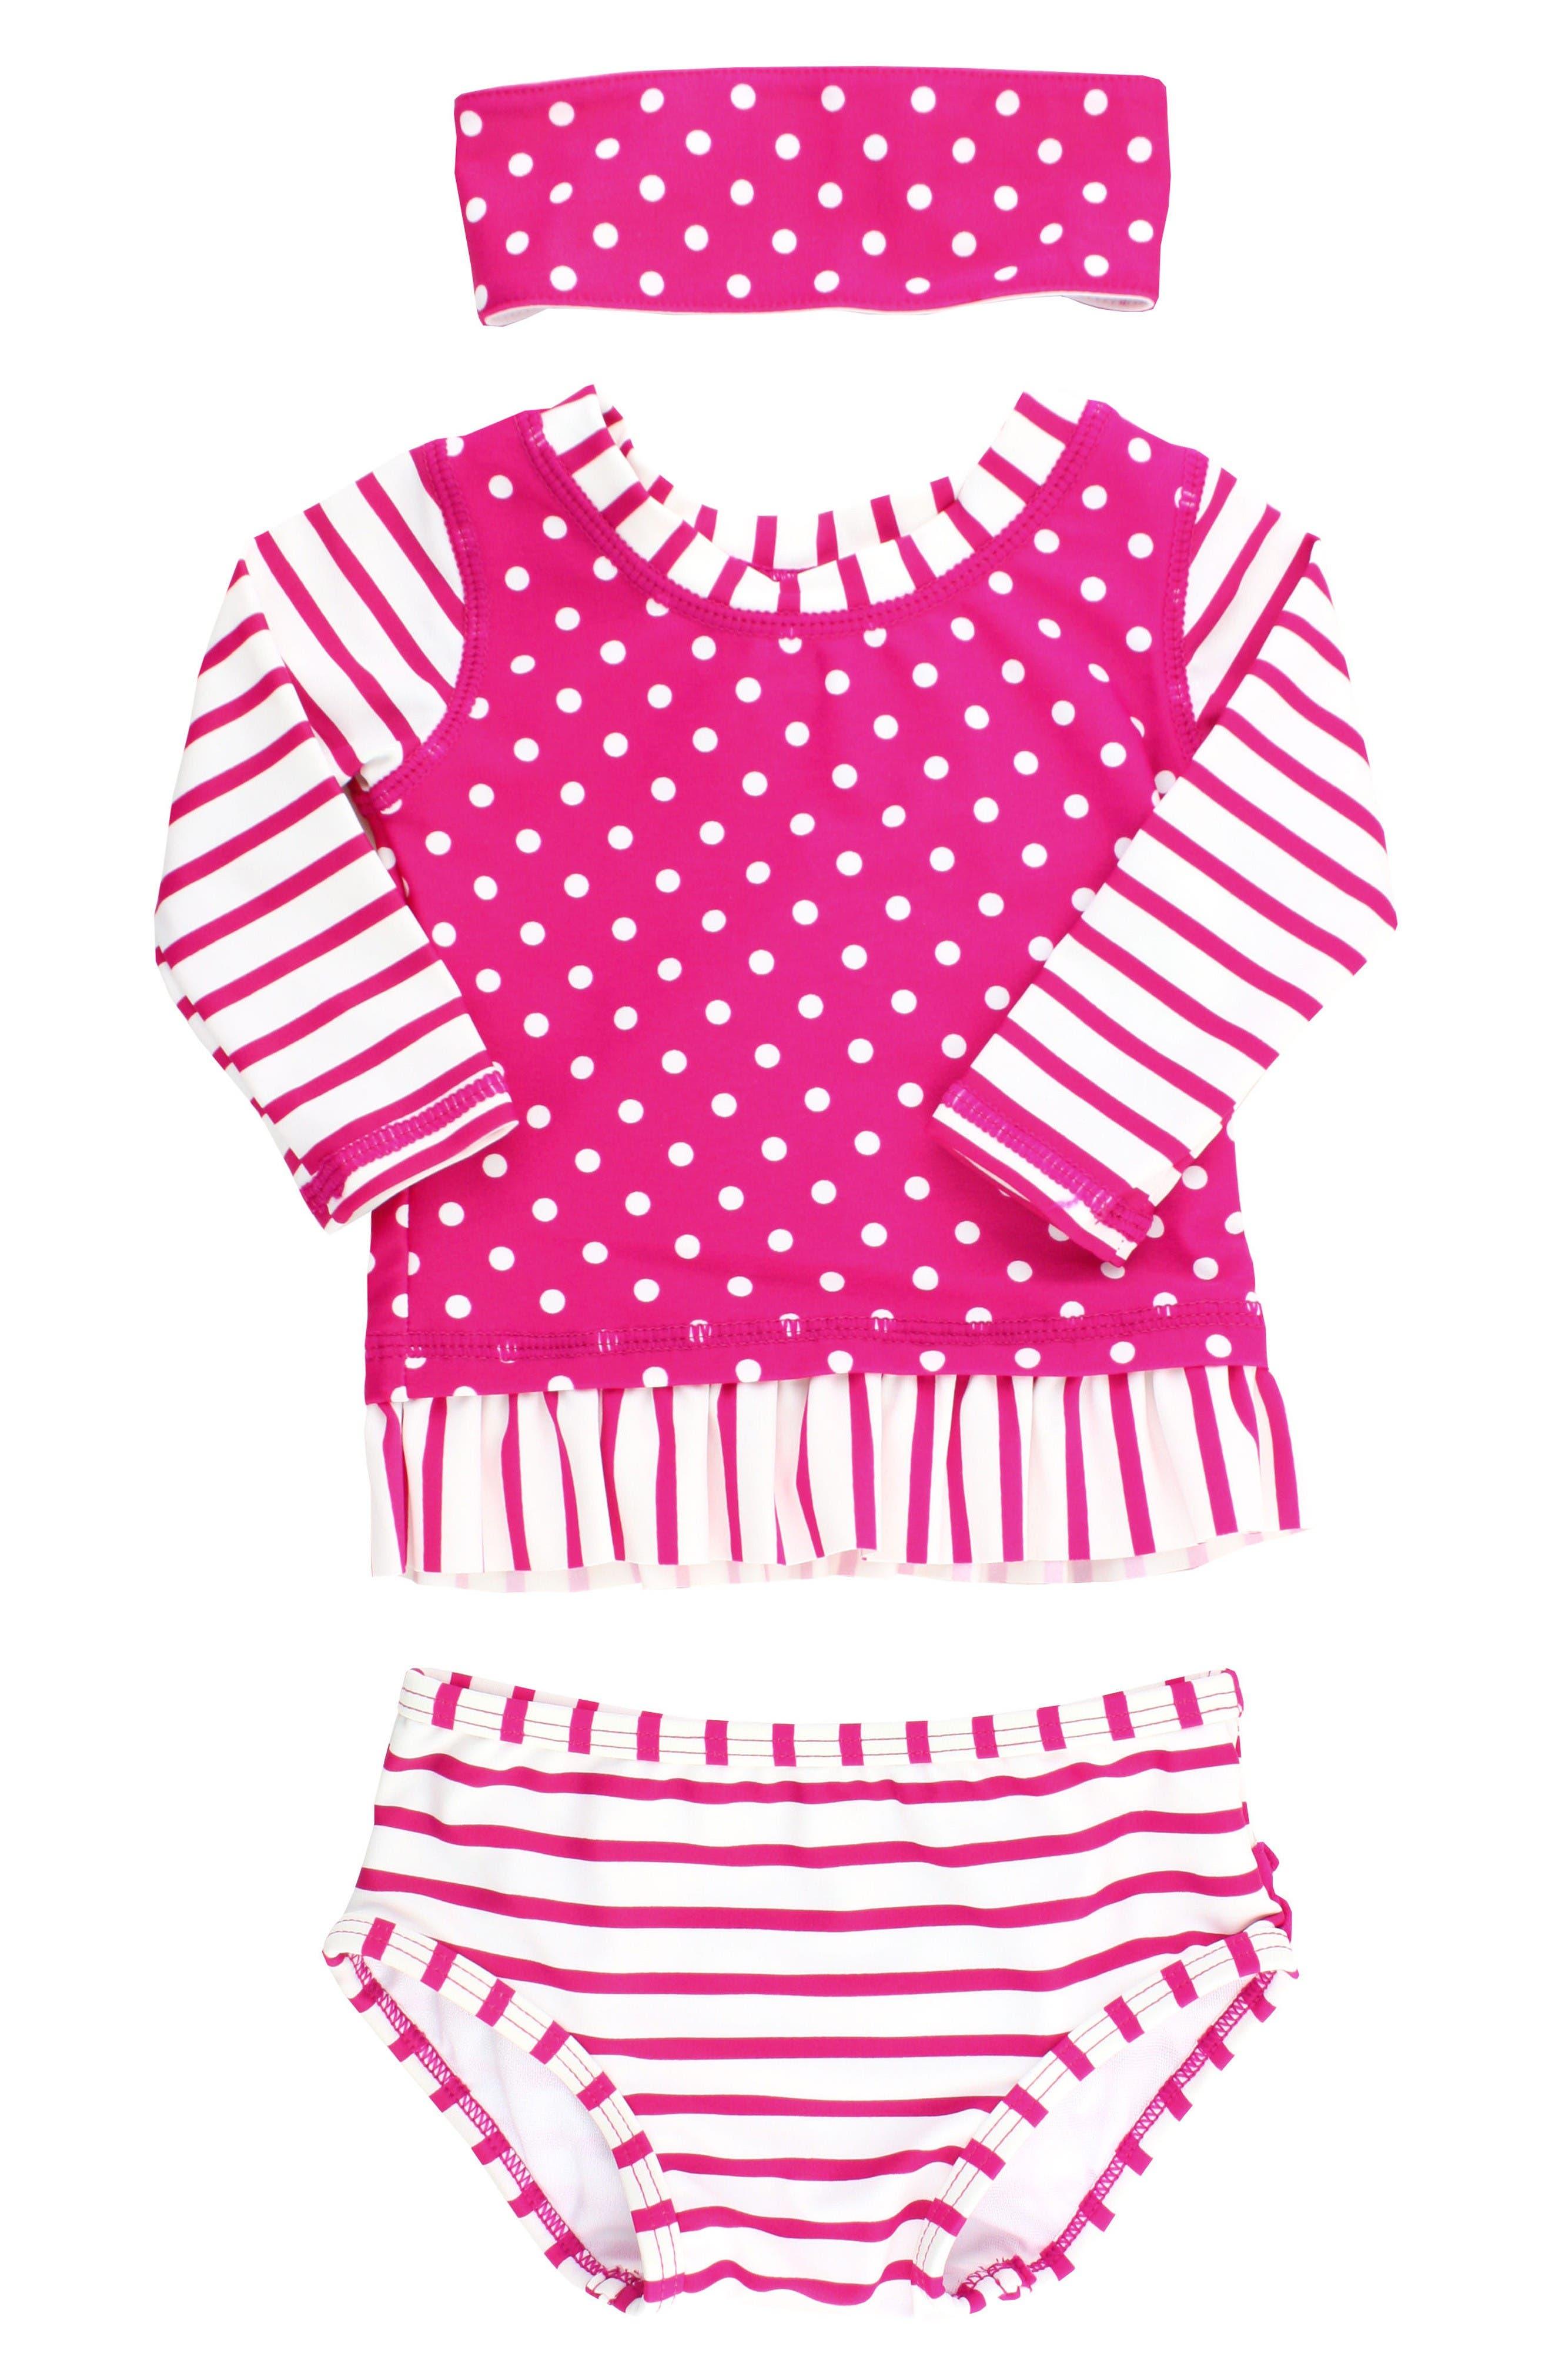 Alternate Image 1 Selected - RuffleButts Two-Piece Rashguard Swimsuit & Head Wrap Set (Baby Girls)